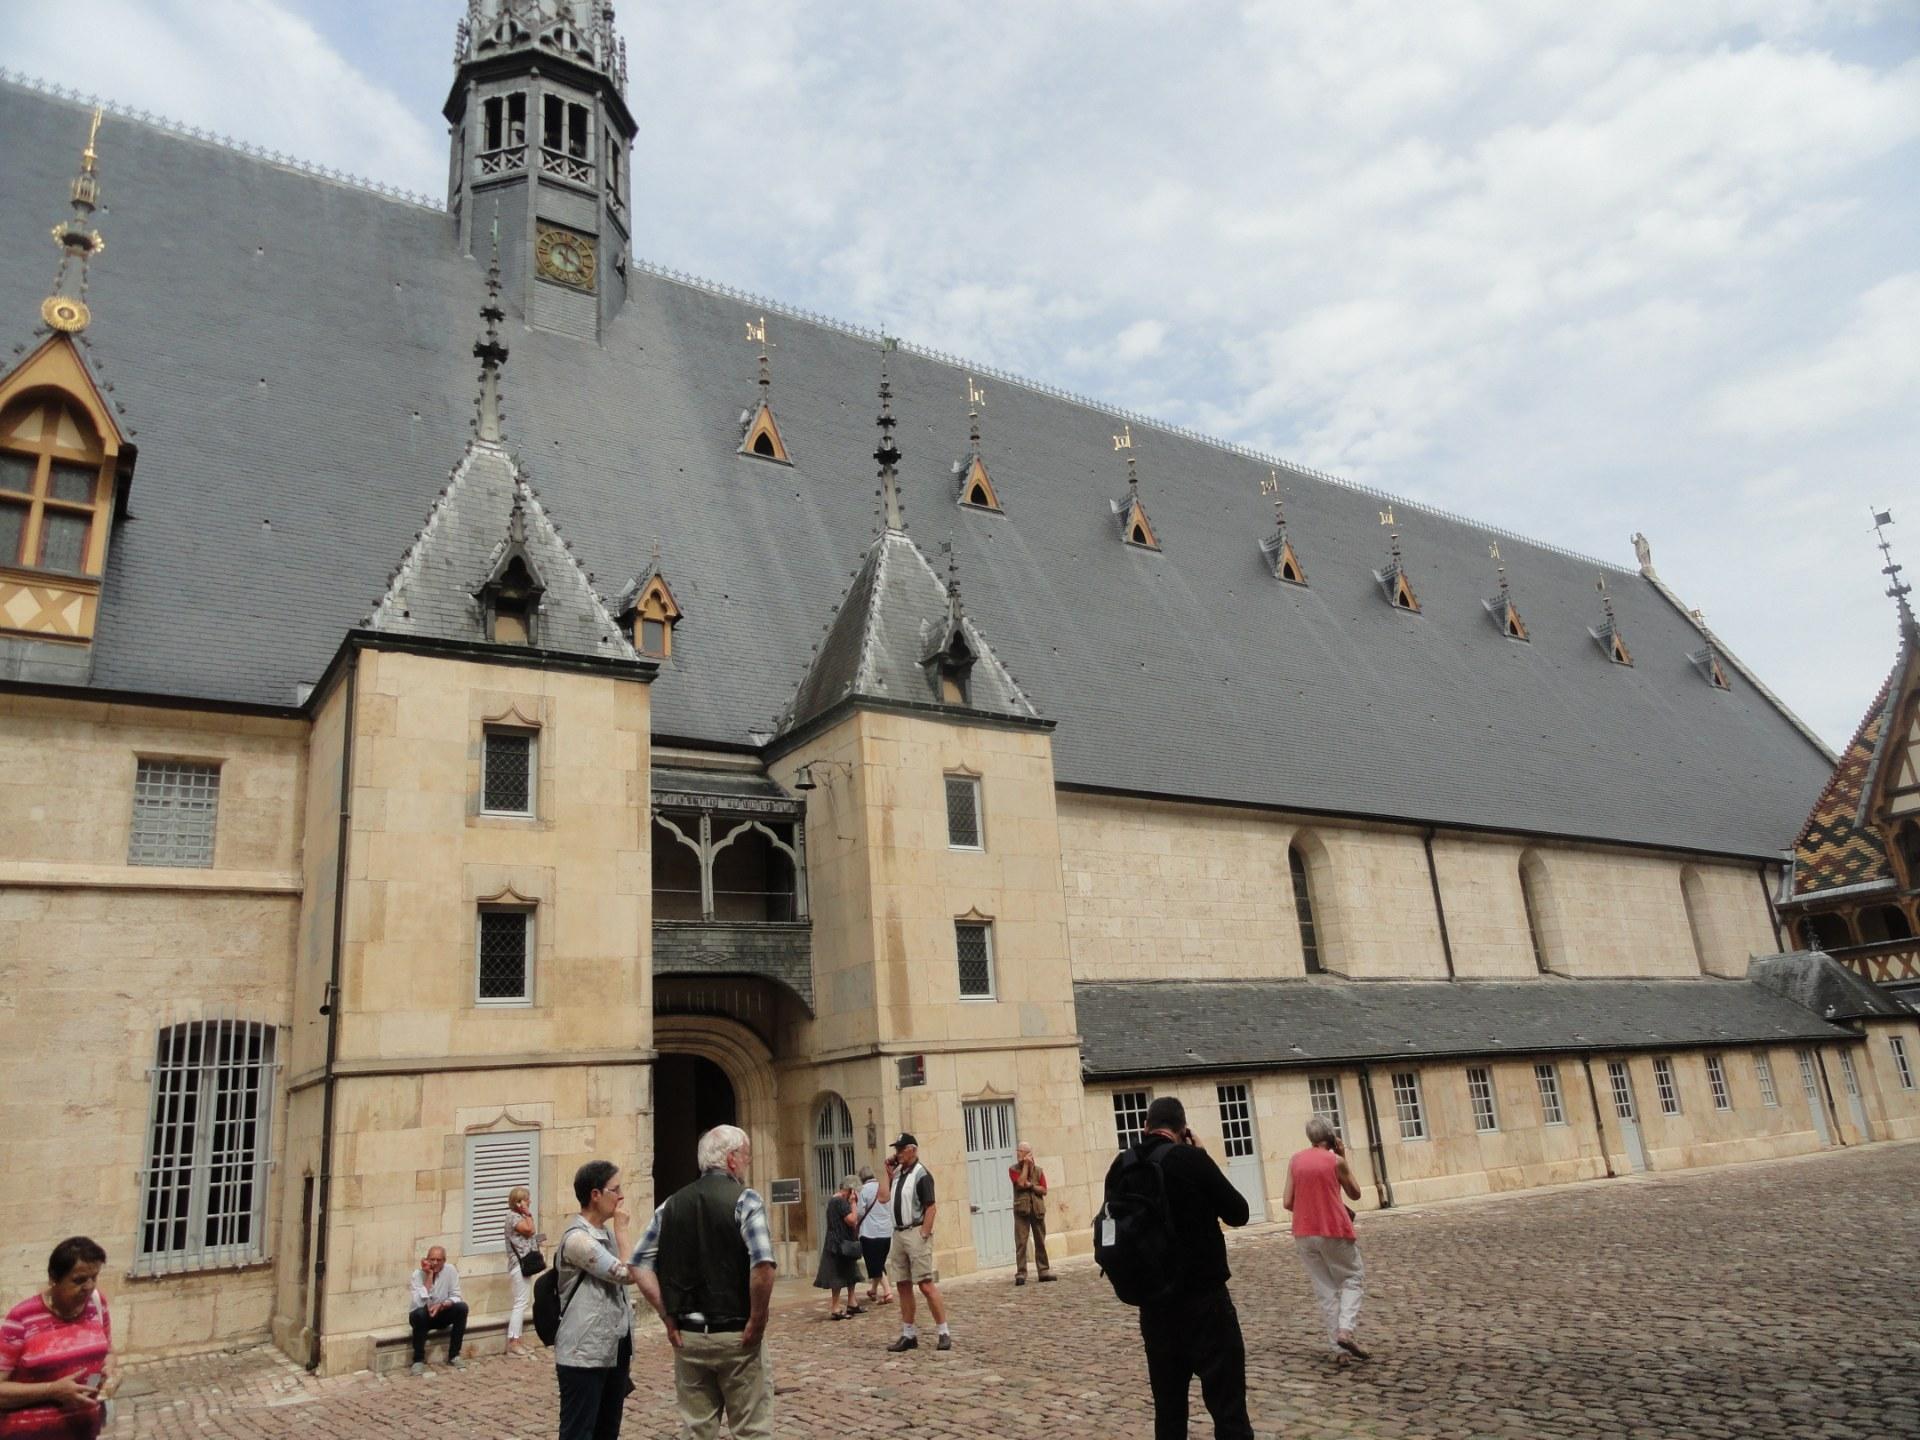 2017-06-16 - Pe#lerinage en Bourgogne - 149